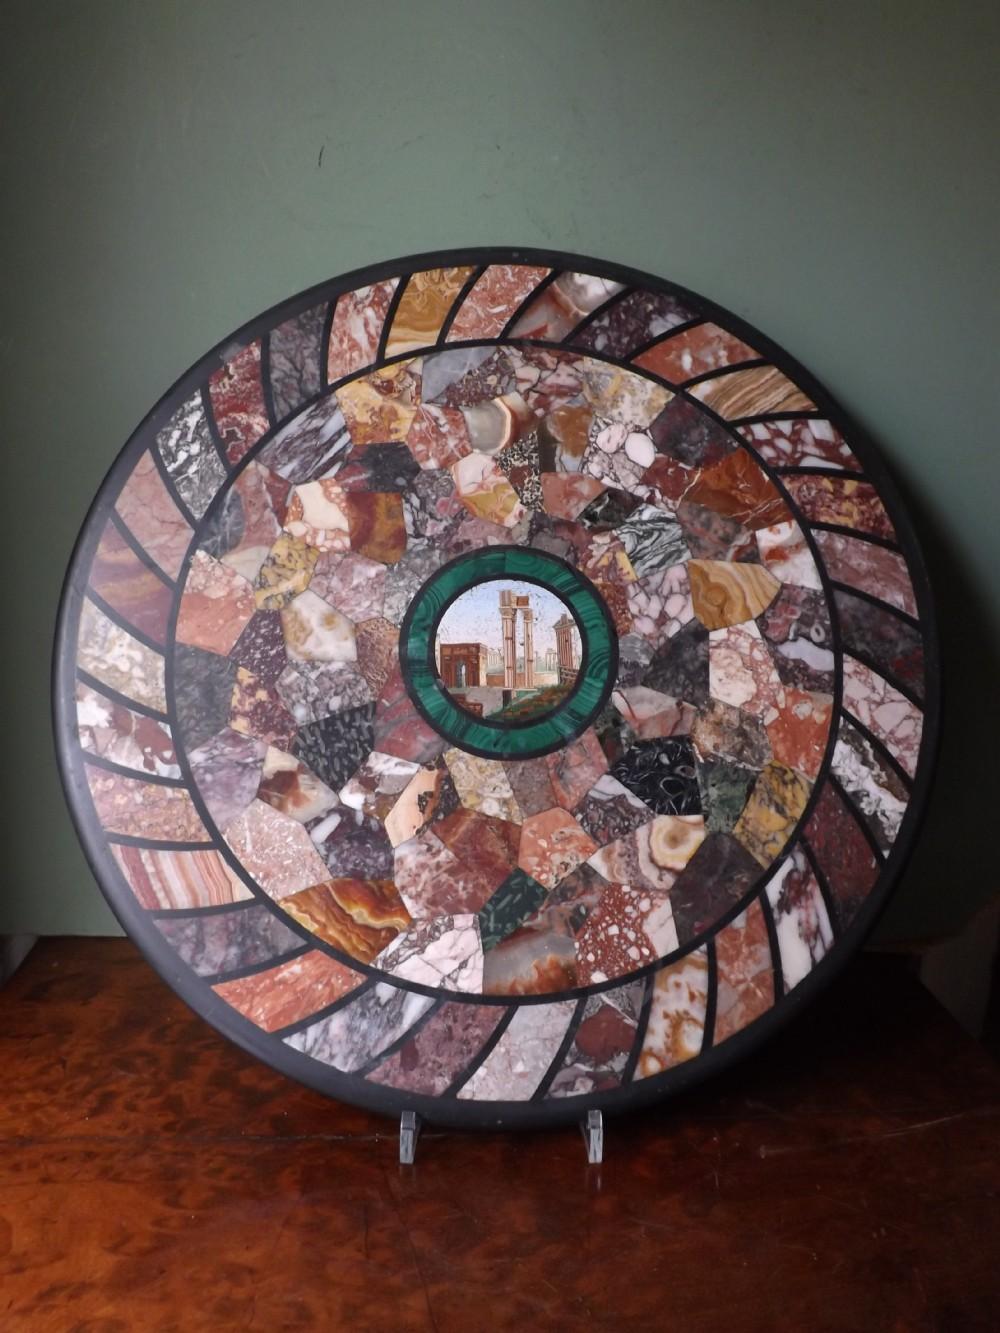 c19th italian grand tour souvenir specimen marble and micromosaic tabletop roundel